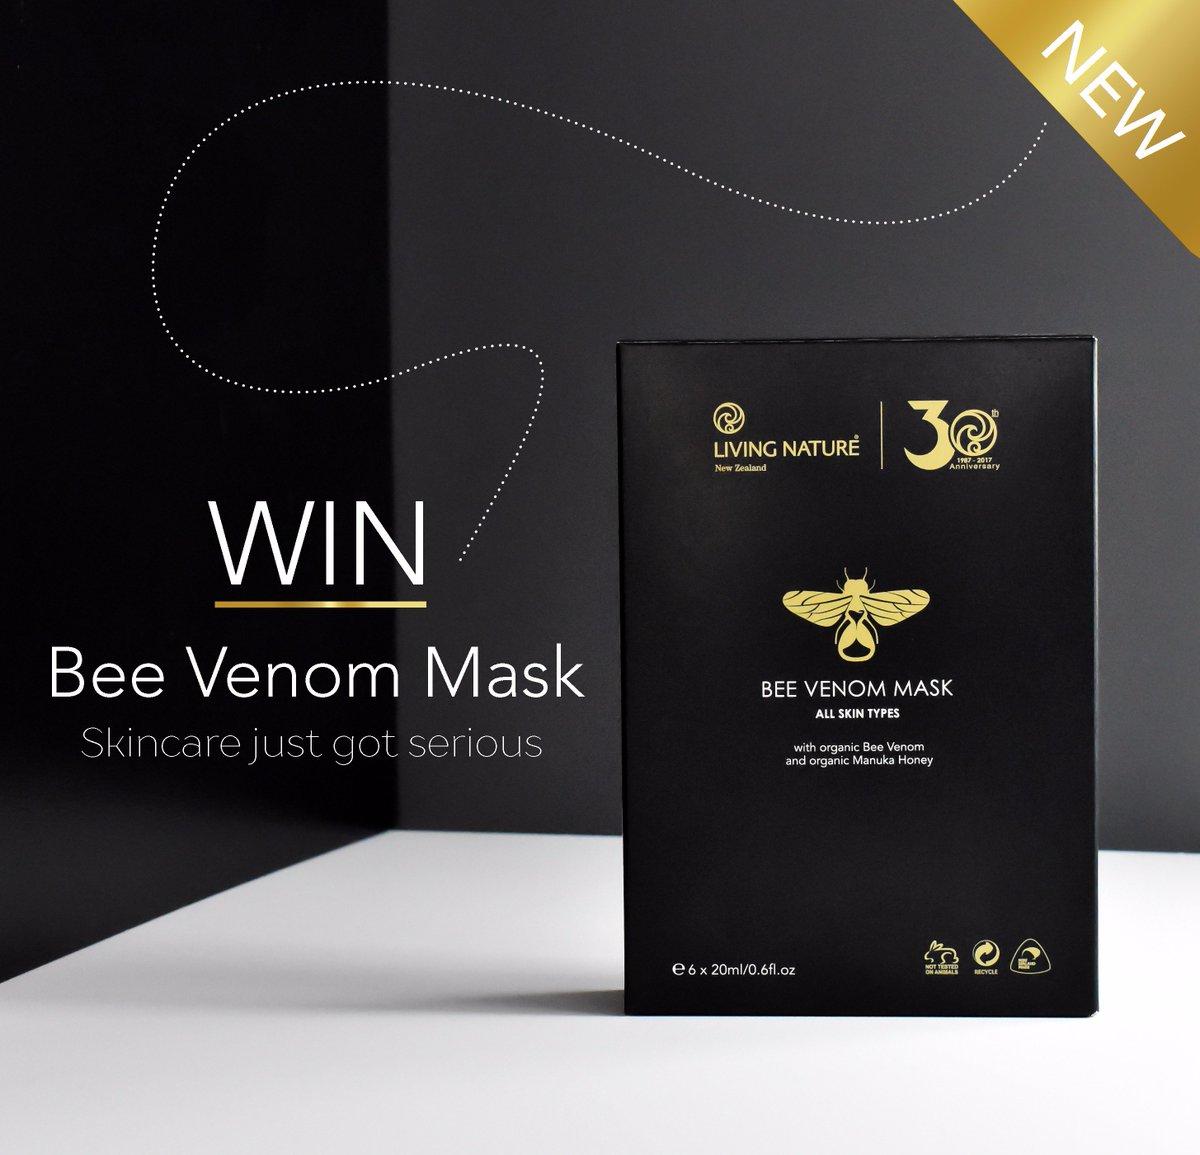 Mặt nạ Living Nature Bee Venom Mask 3